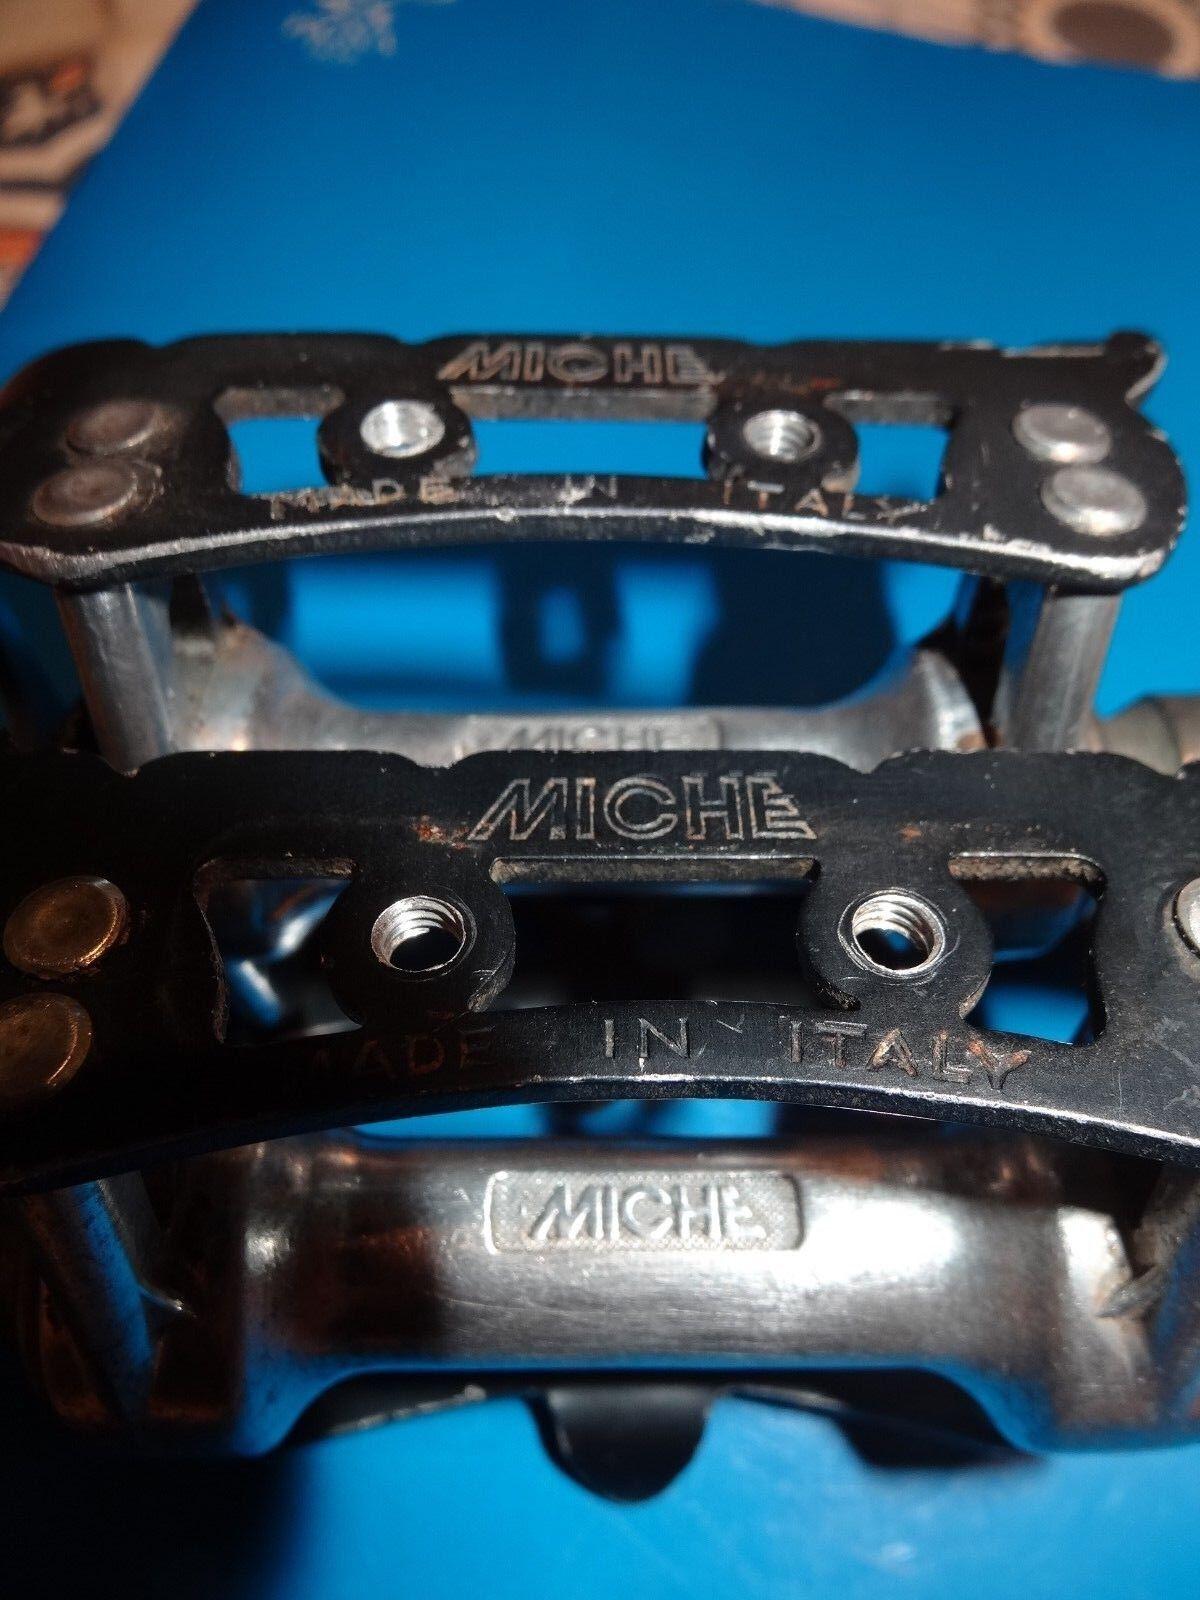 Vintage Miche Speciali 1201, 1201, 1201, Competition Pedales mid1980's 330gr L'Eroica d850ee